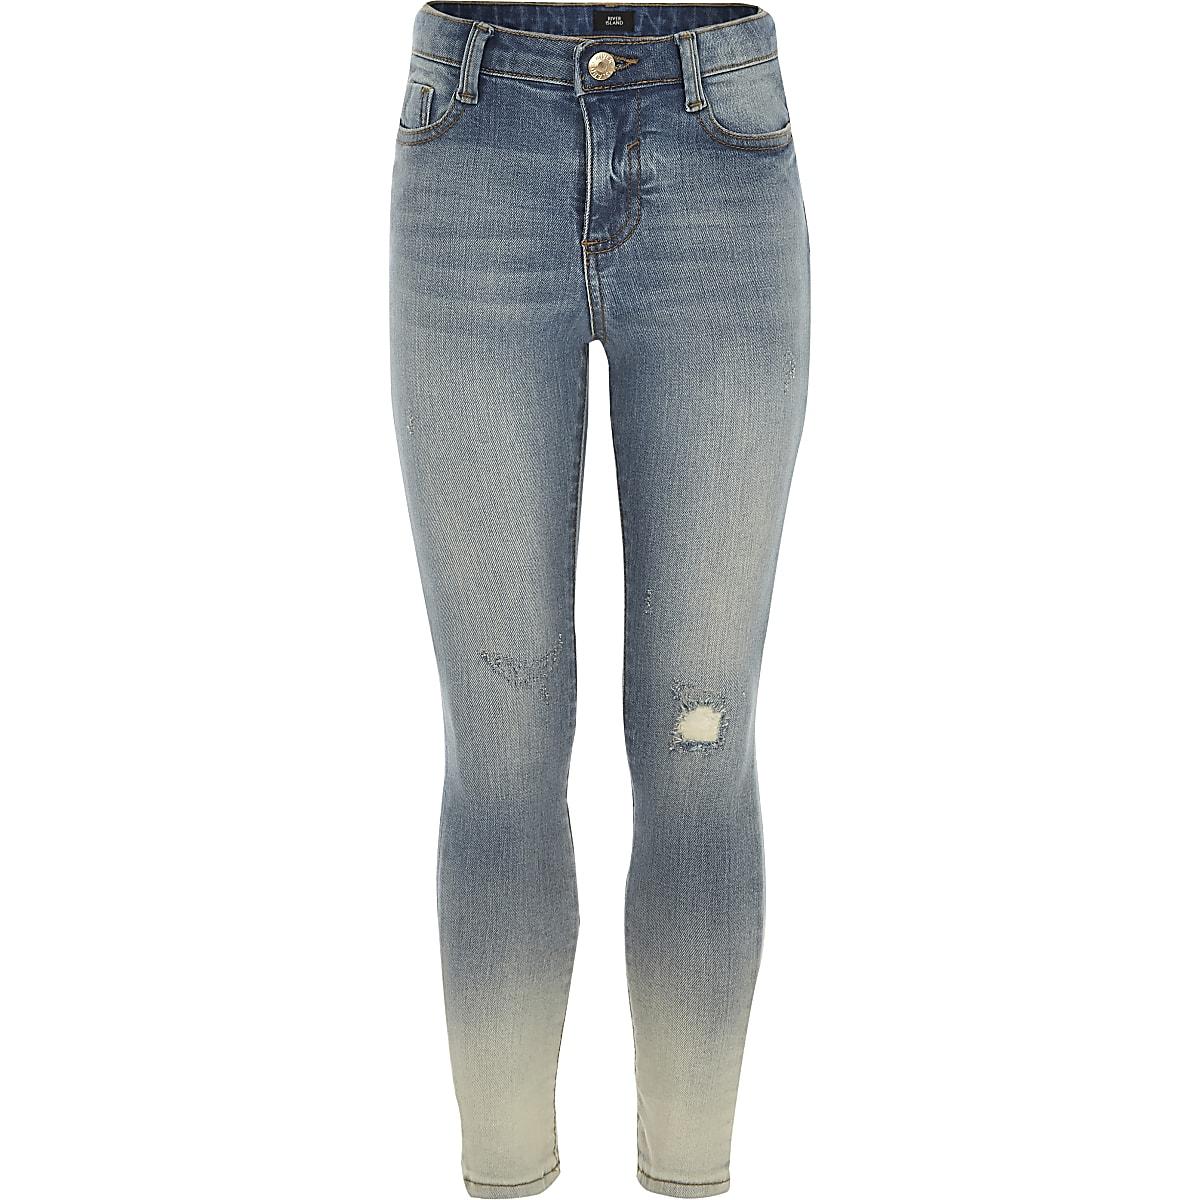 Girls Amelie dip dye distressed jeans